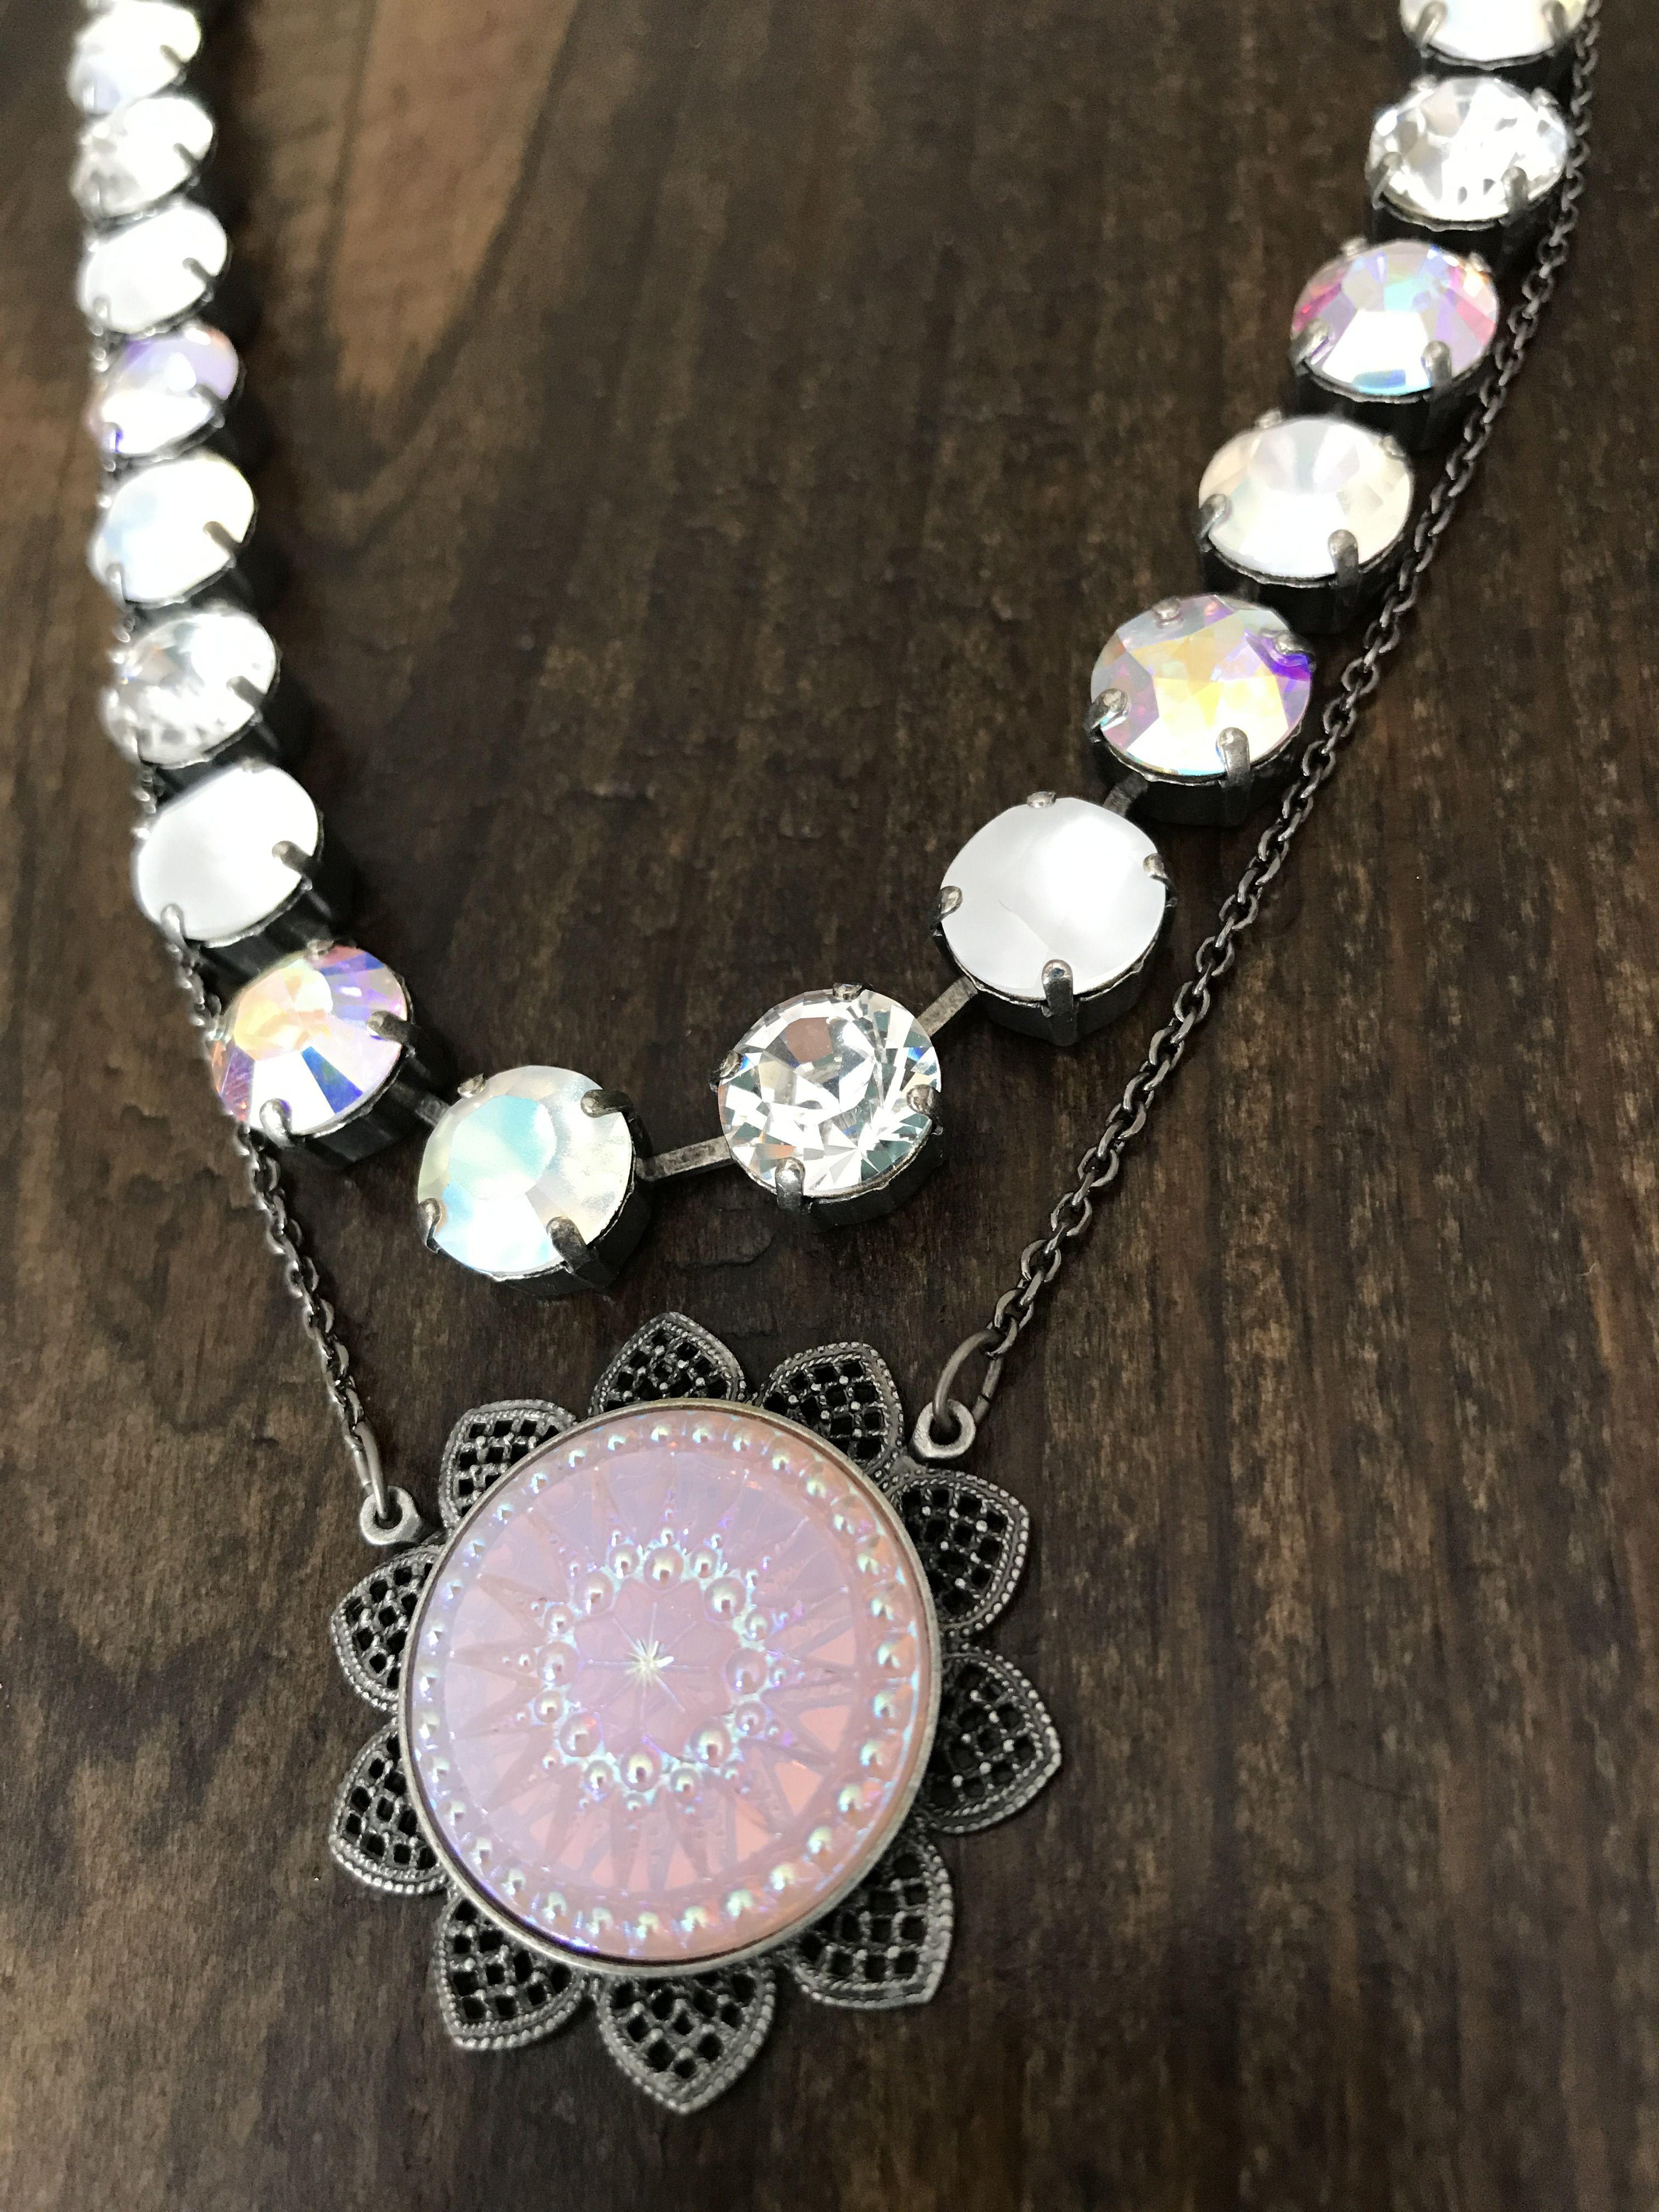 Sabika look necklace - Sabika Ornate Medallion With June 2017 Edition Necklace